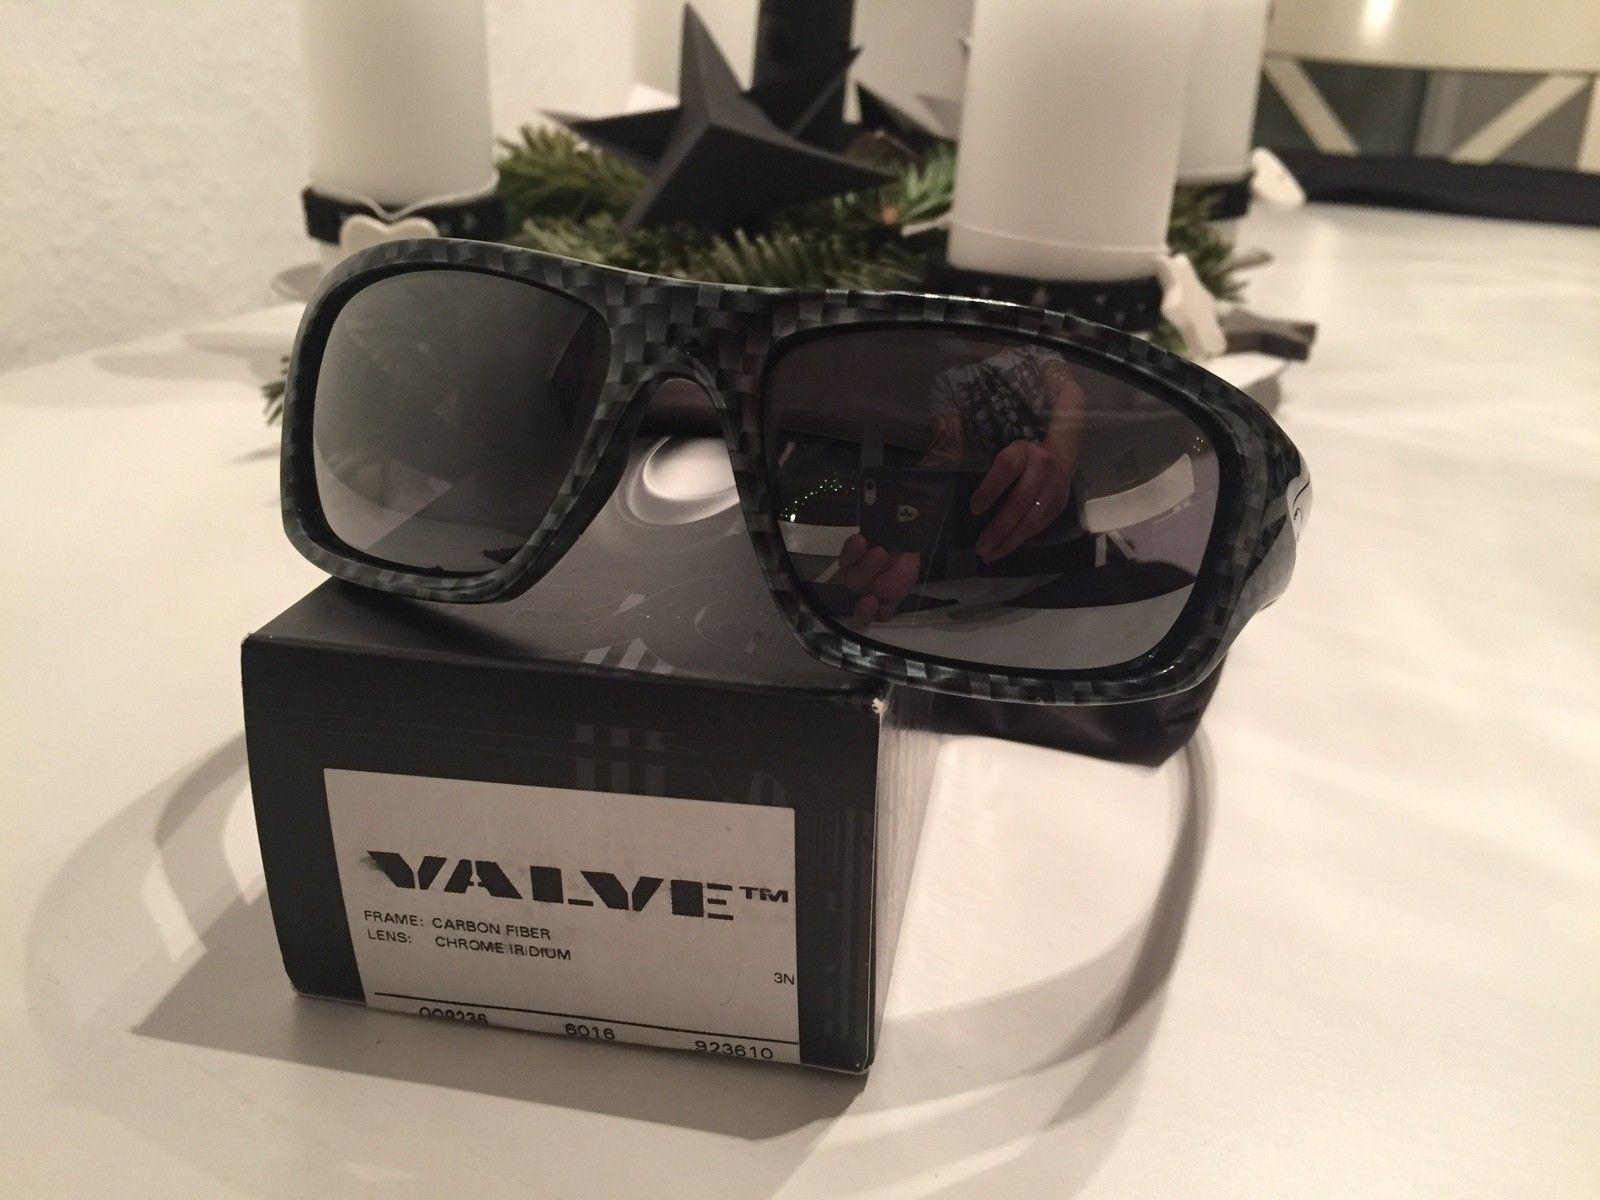 Free Valve Carbon giveaway - image.jpeg